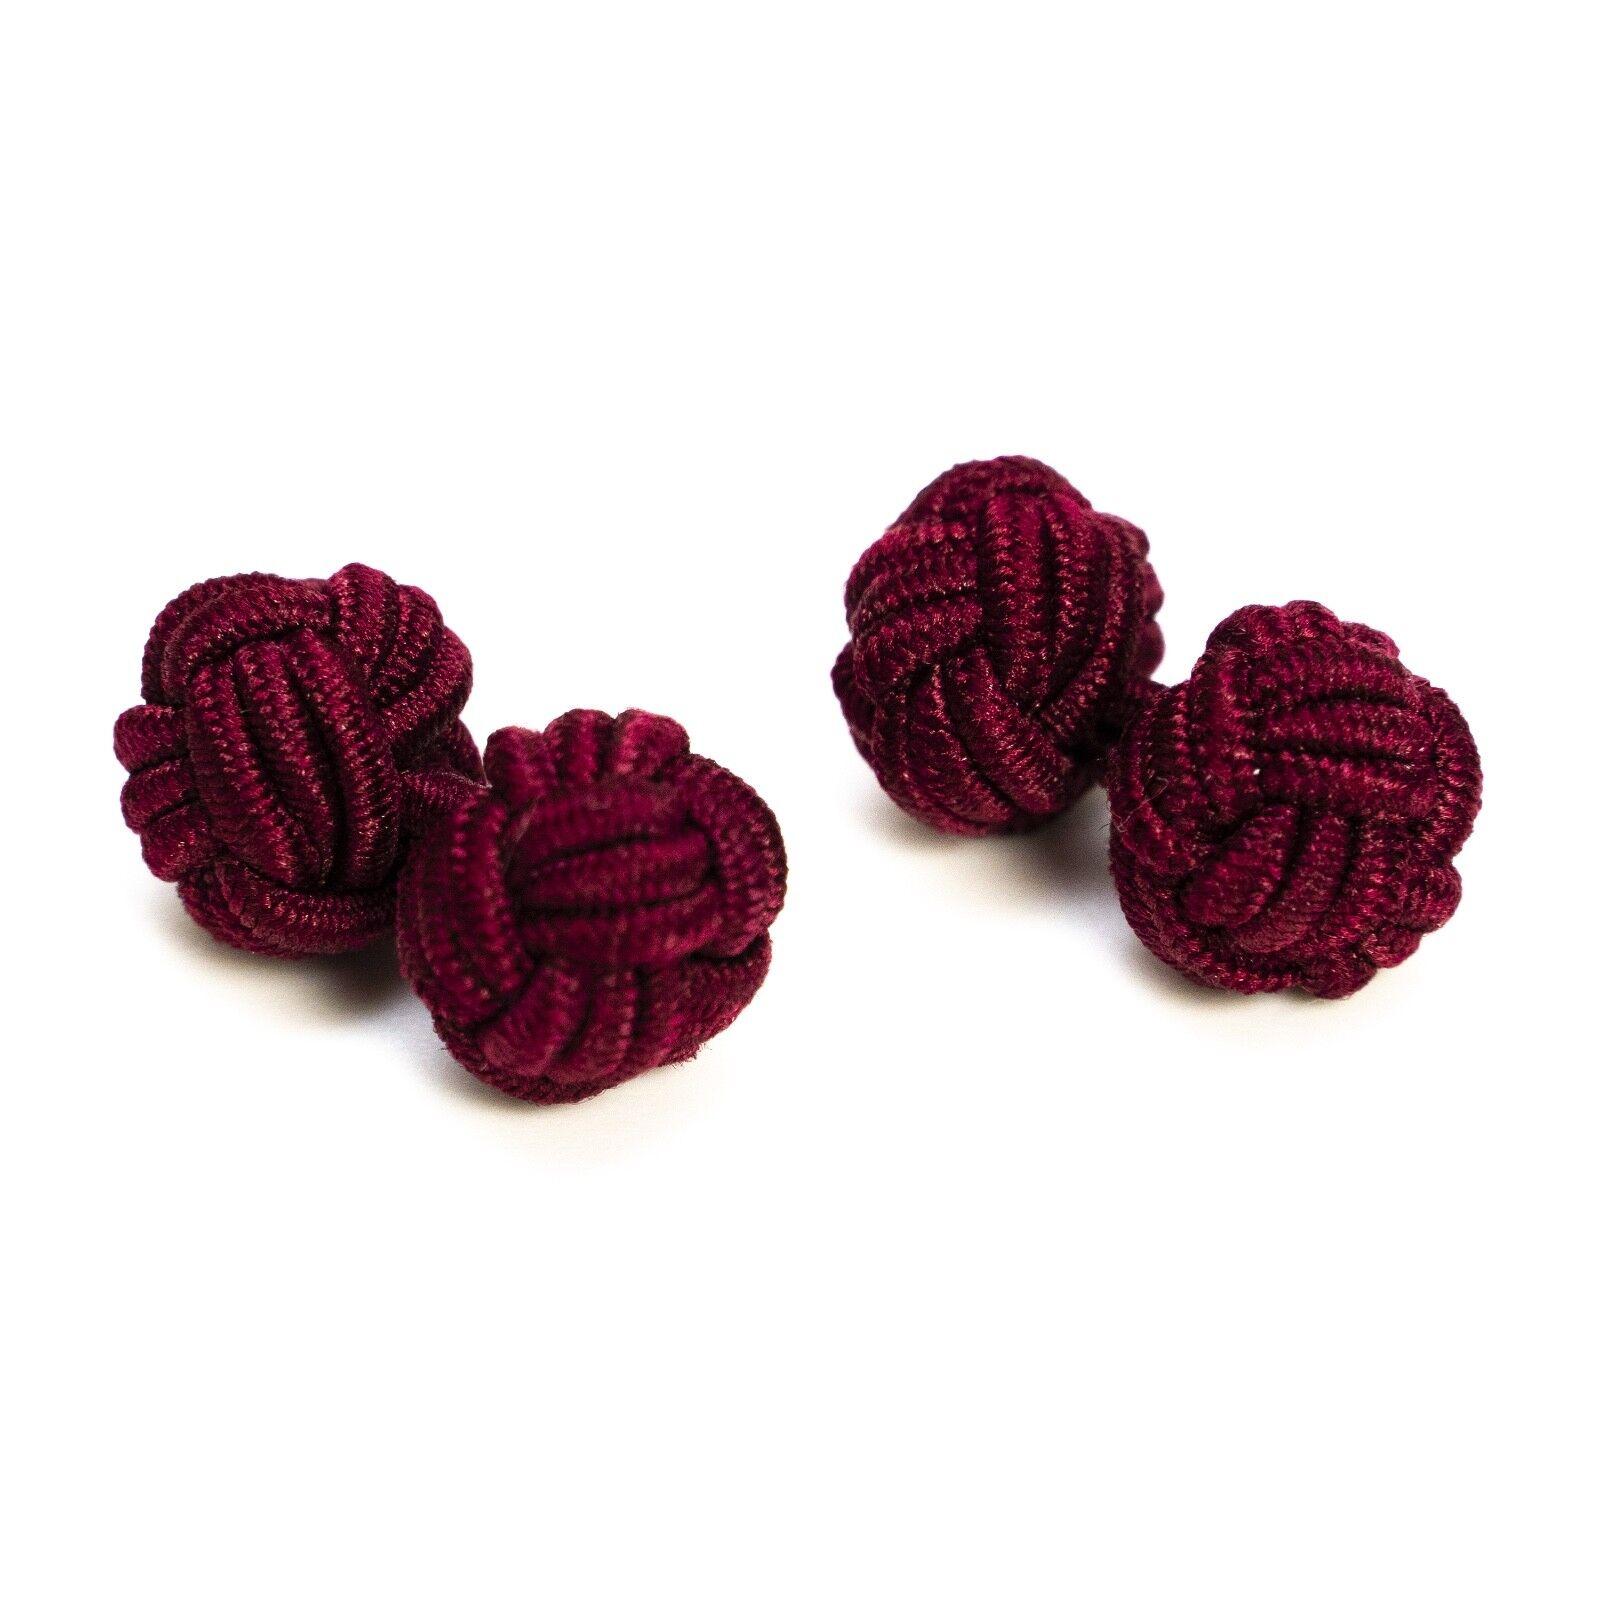 1 Paar Seidenknoten / Manschettenknöpfe / Cufflinks, bordeaux rot Gentleman